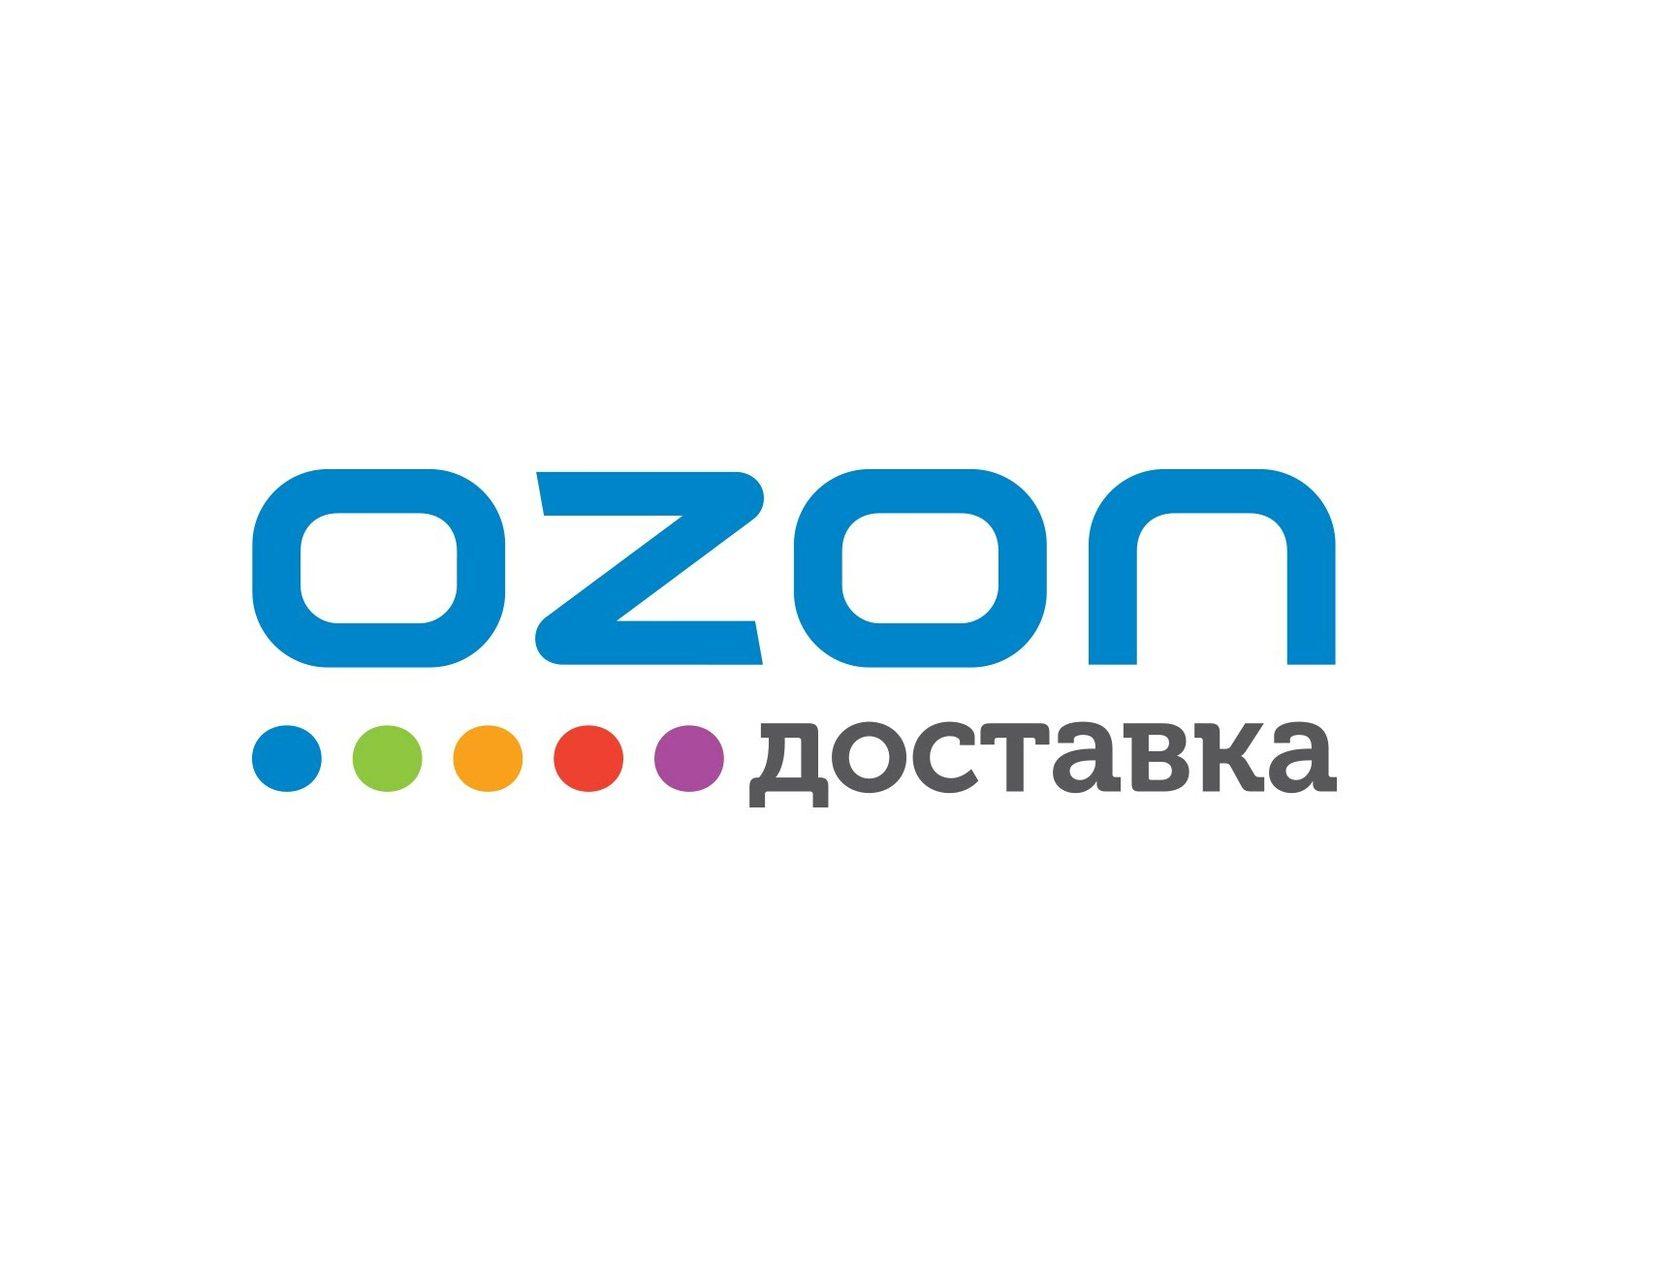 Интернет магазин Озон